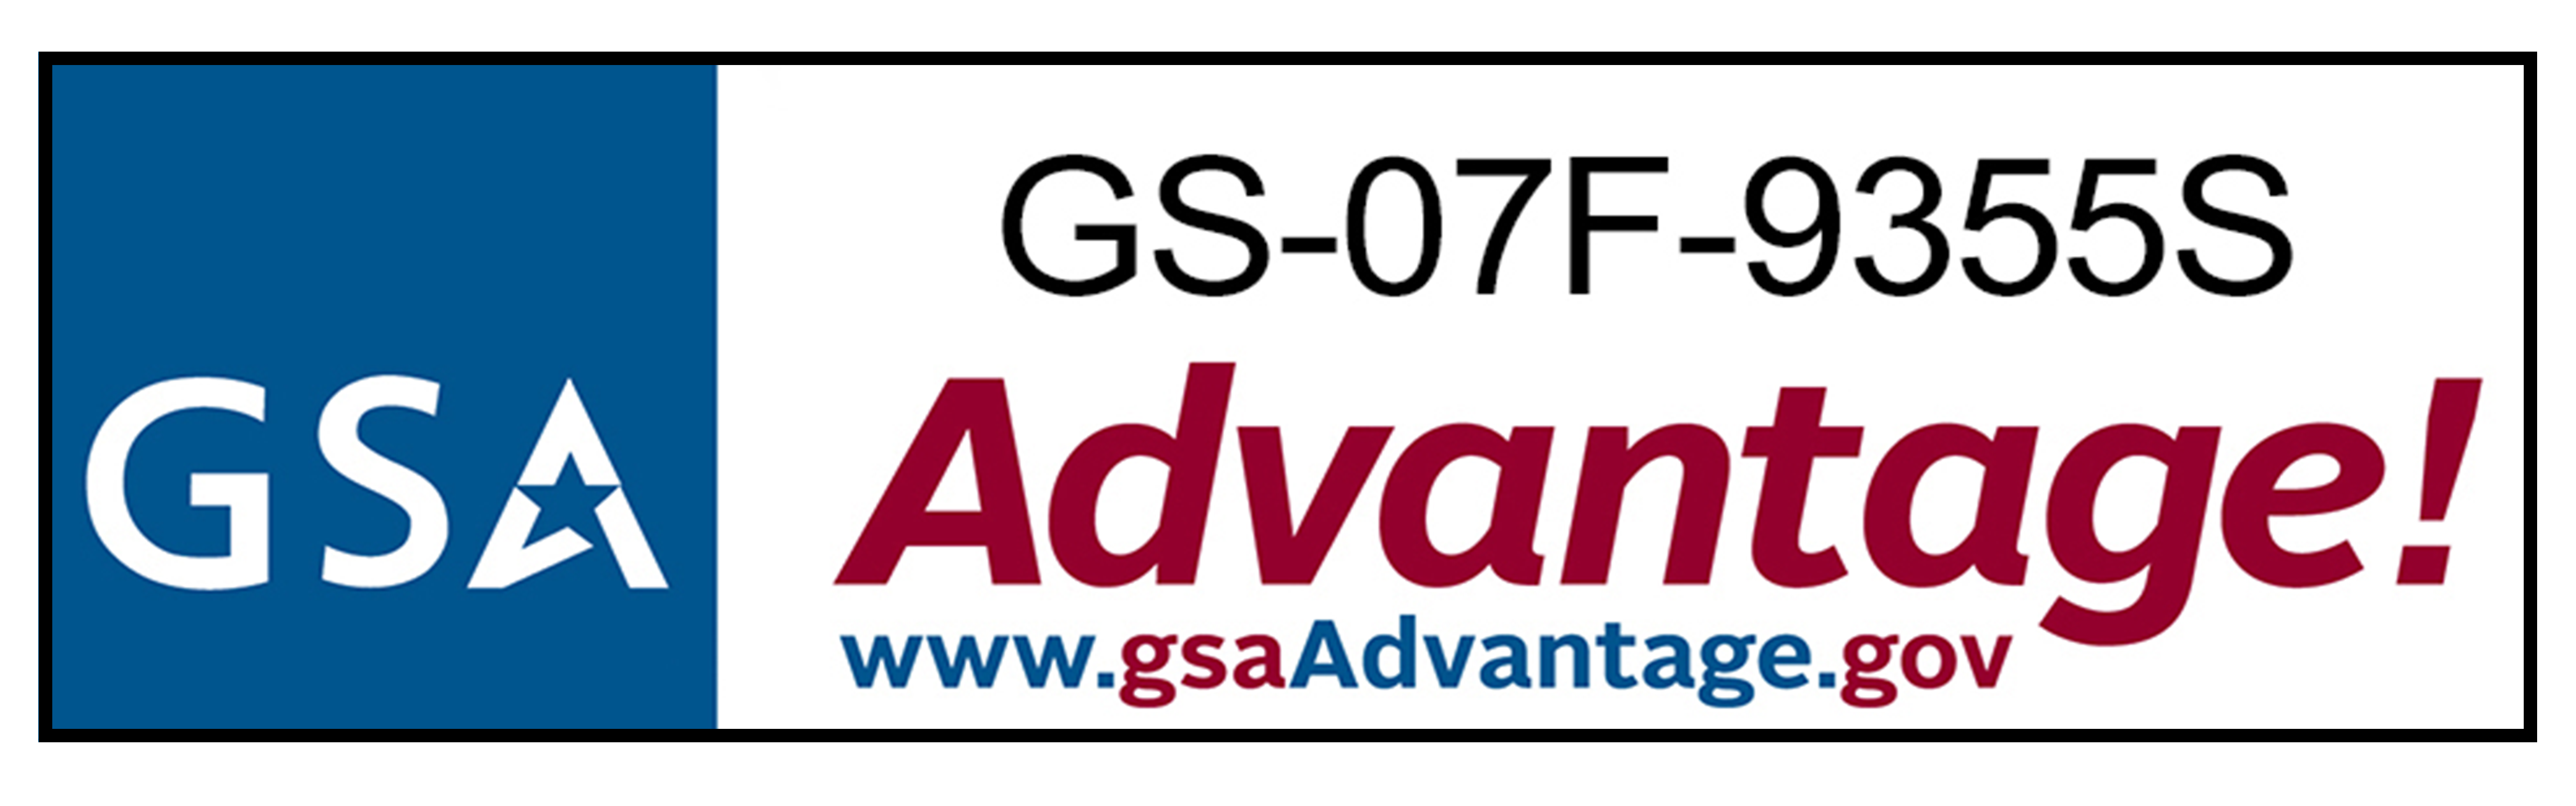 gsa-advantage